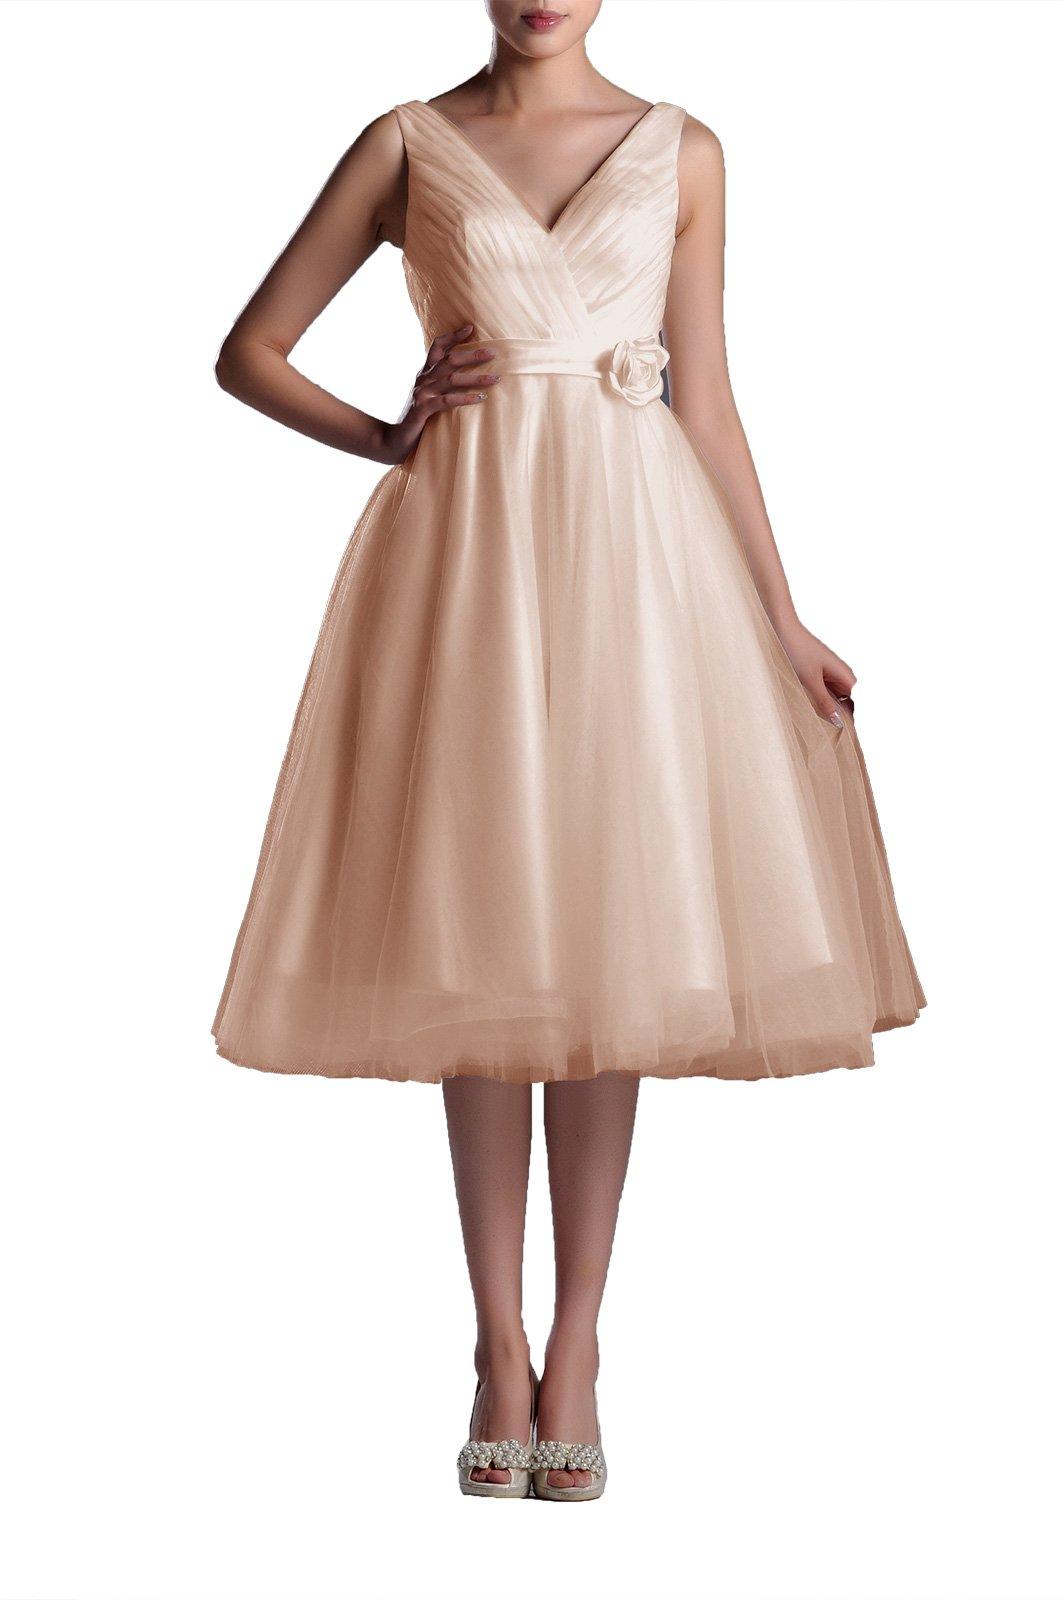 Wedding Dresses V-Neck Bridal Gowns Simple A-line Tea Length Wedding Dress Bride Short